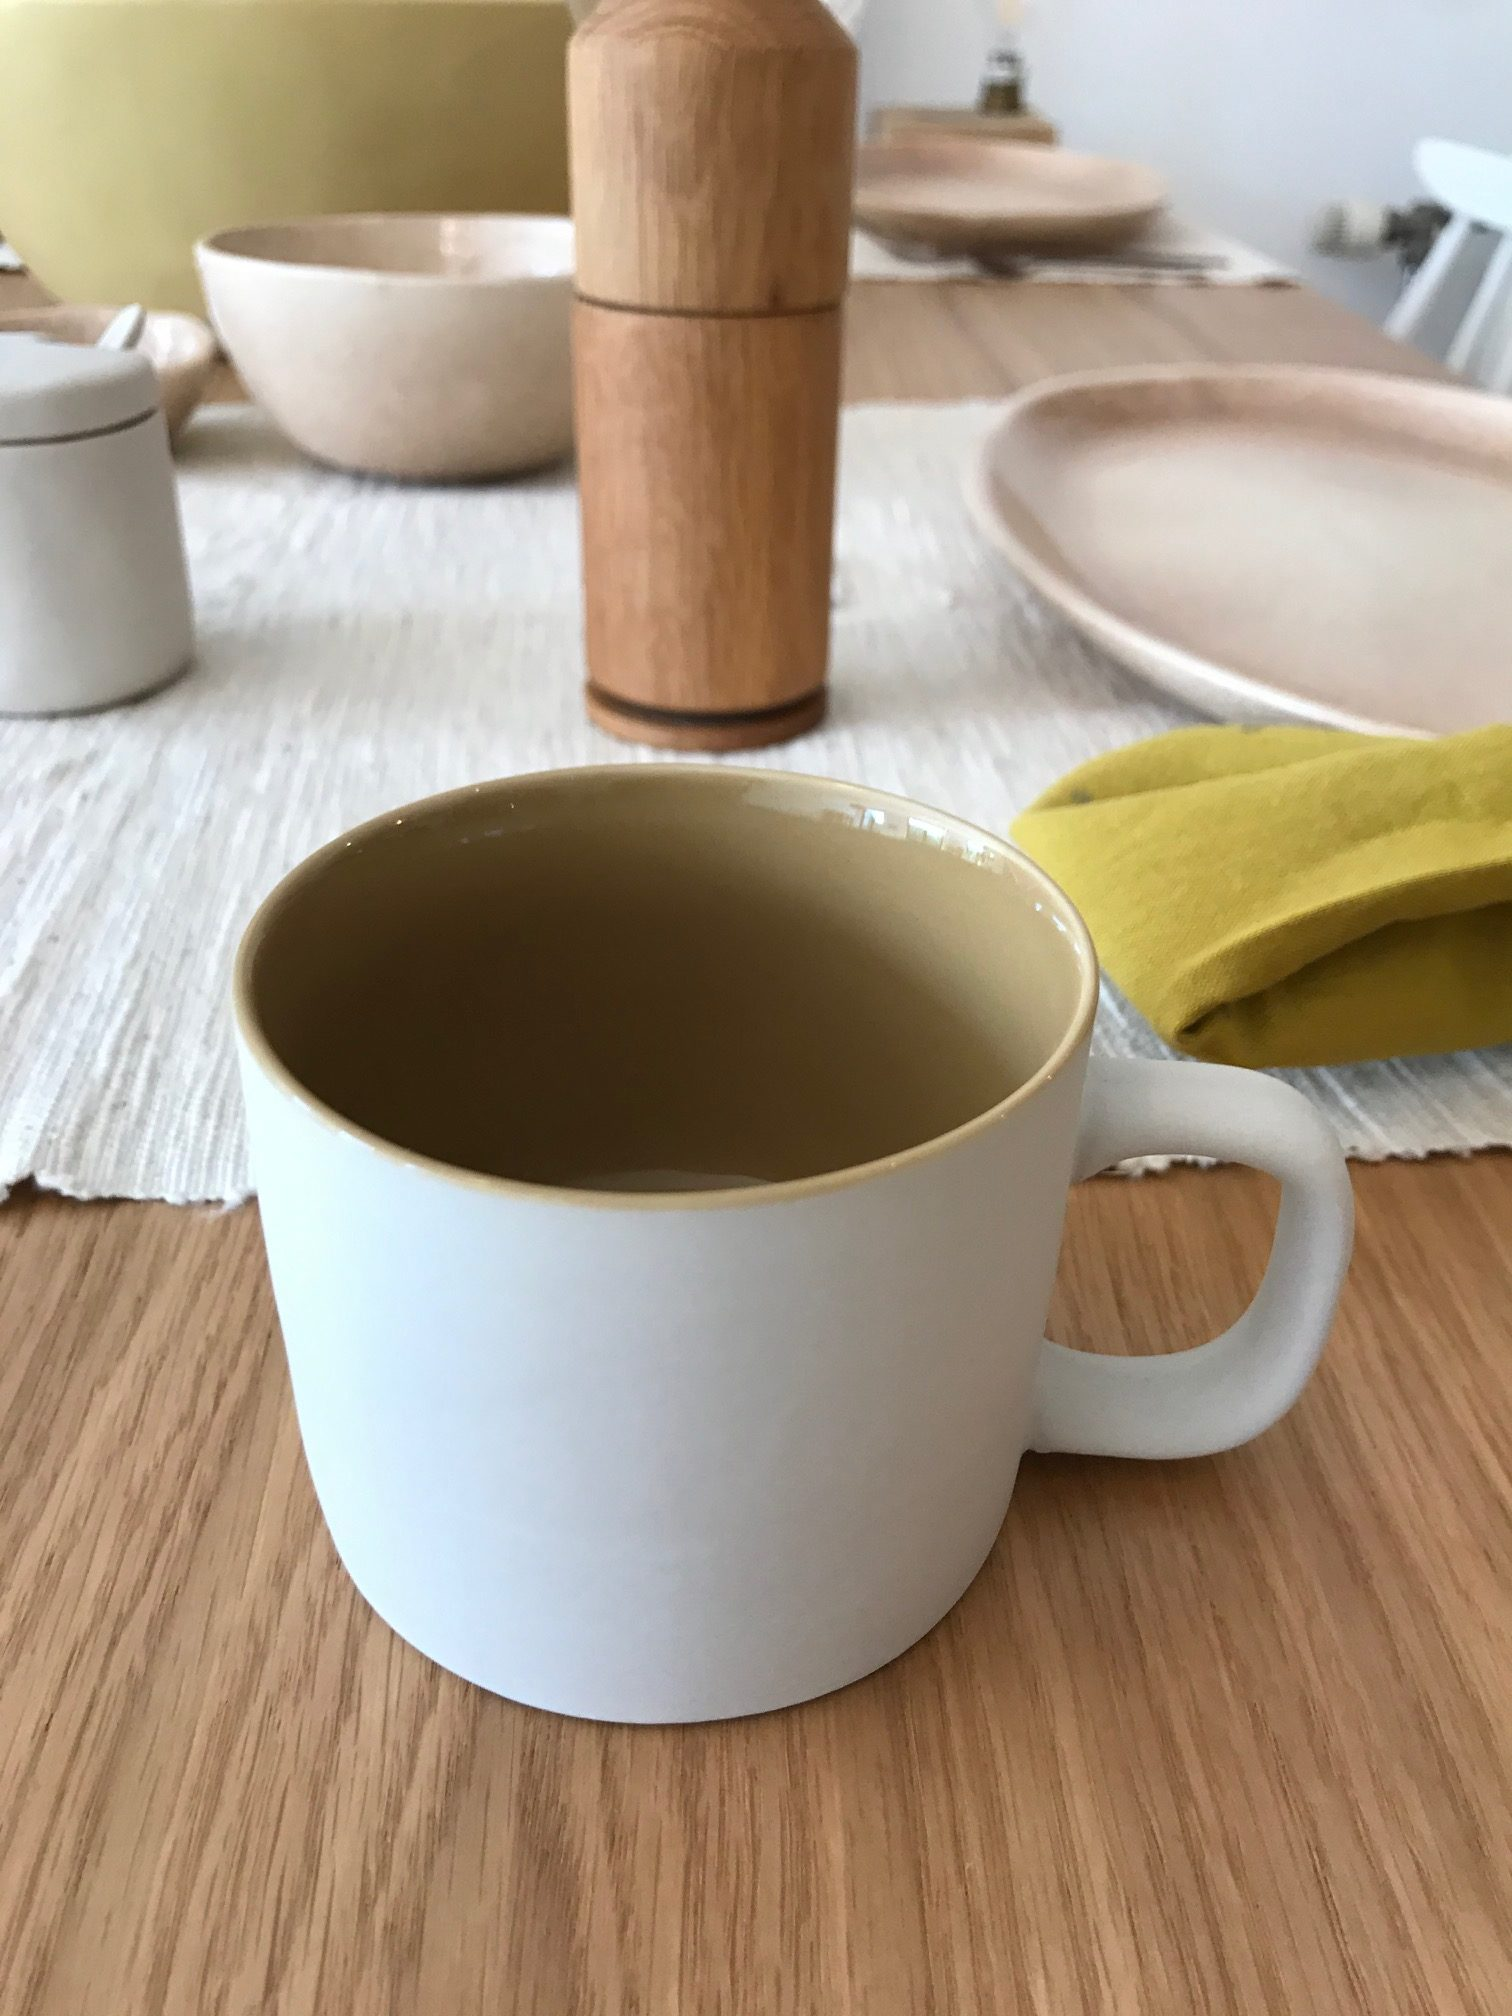 Tasse mate greige intérieur émaillé jaune moutarde  200ml * Kinta